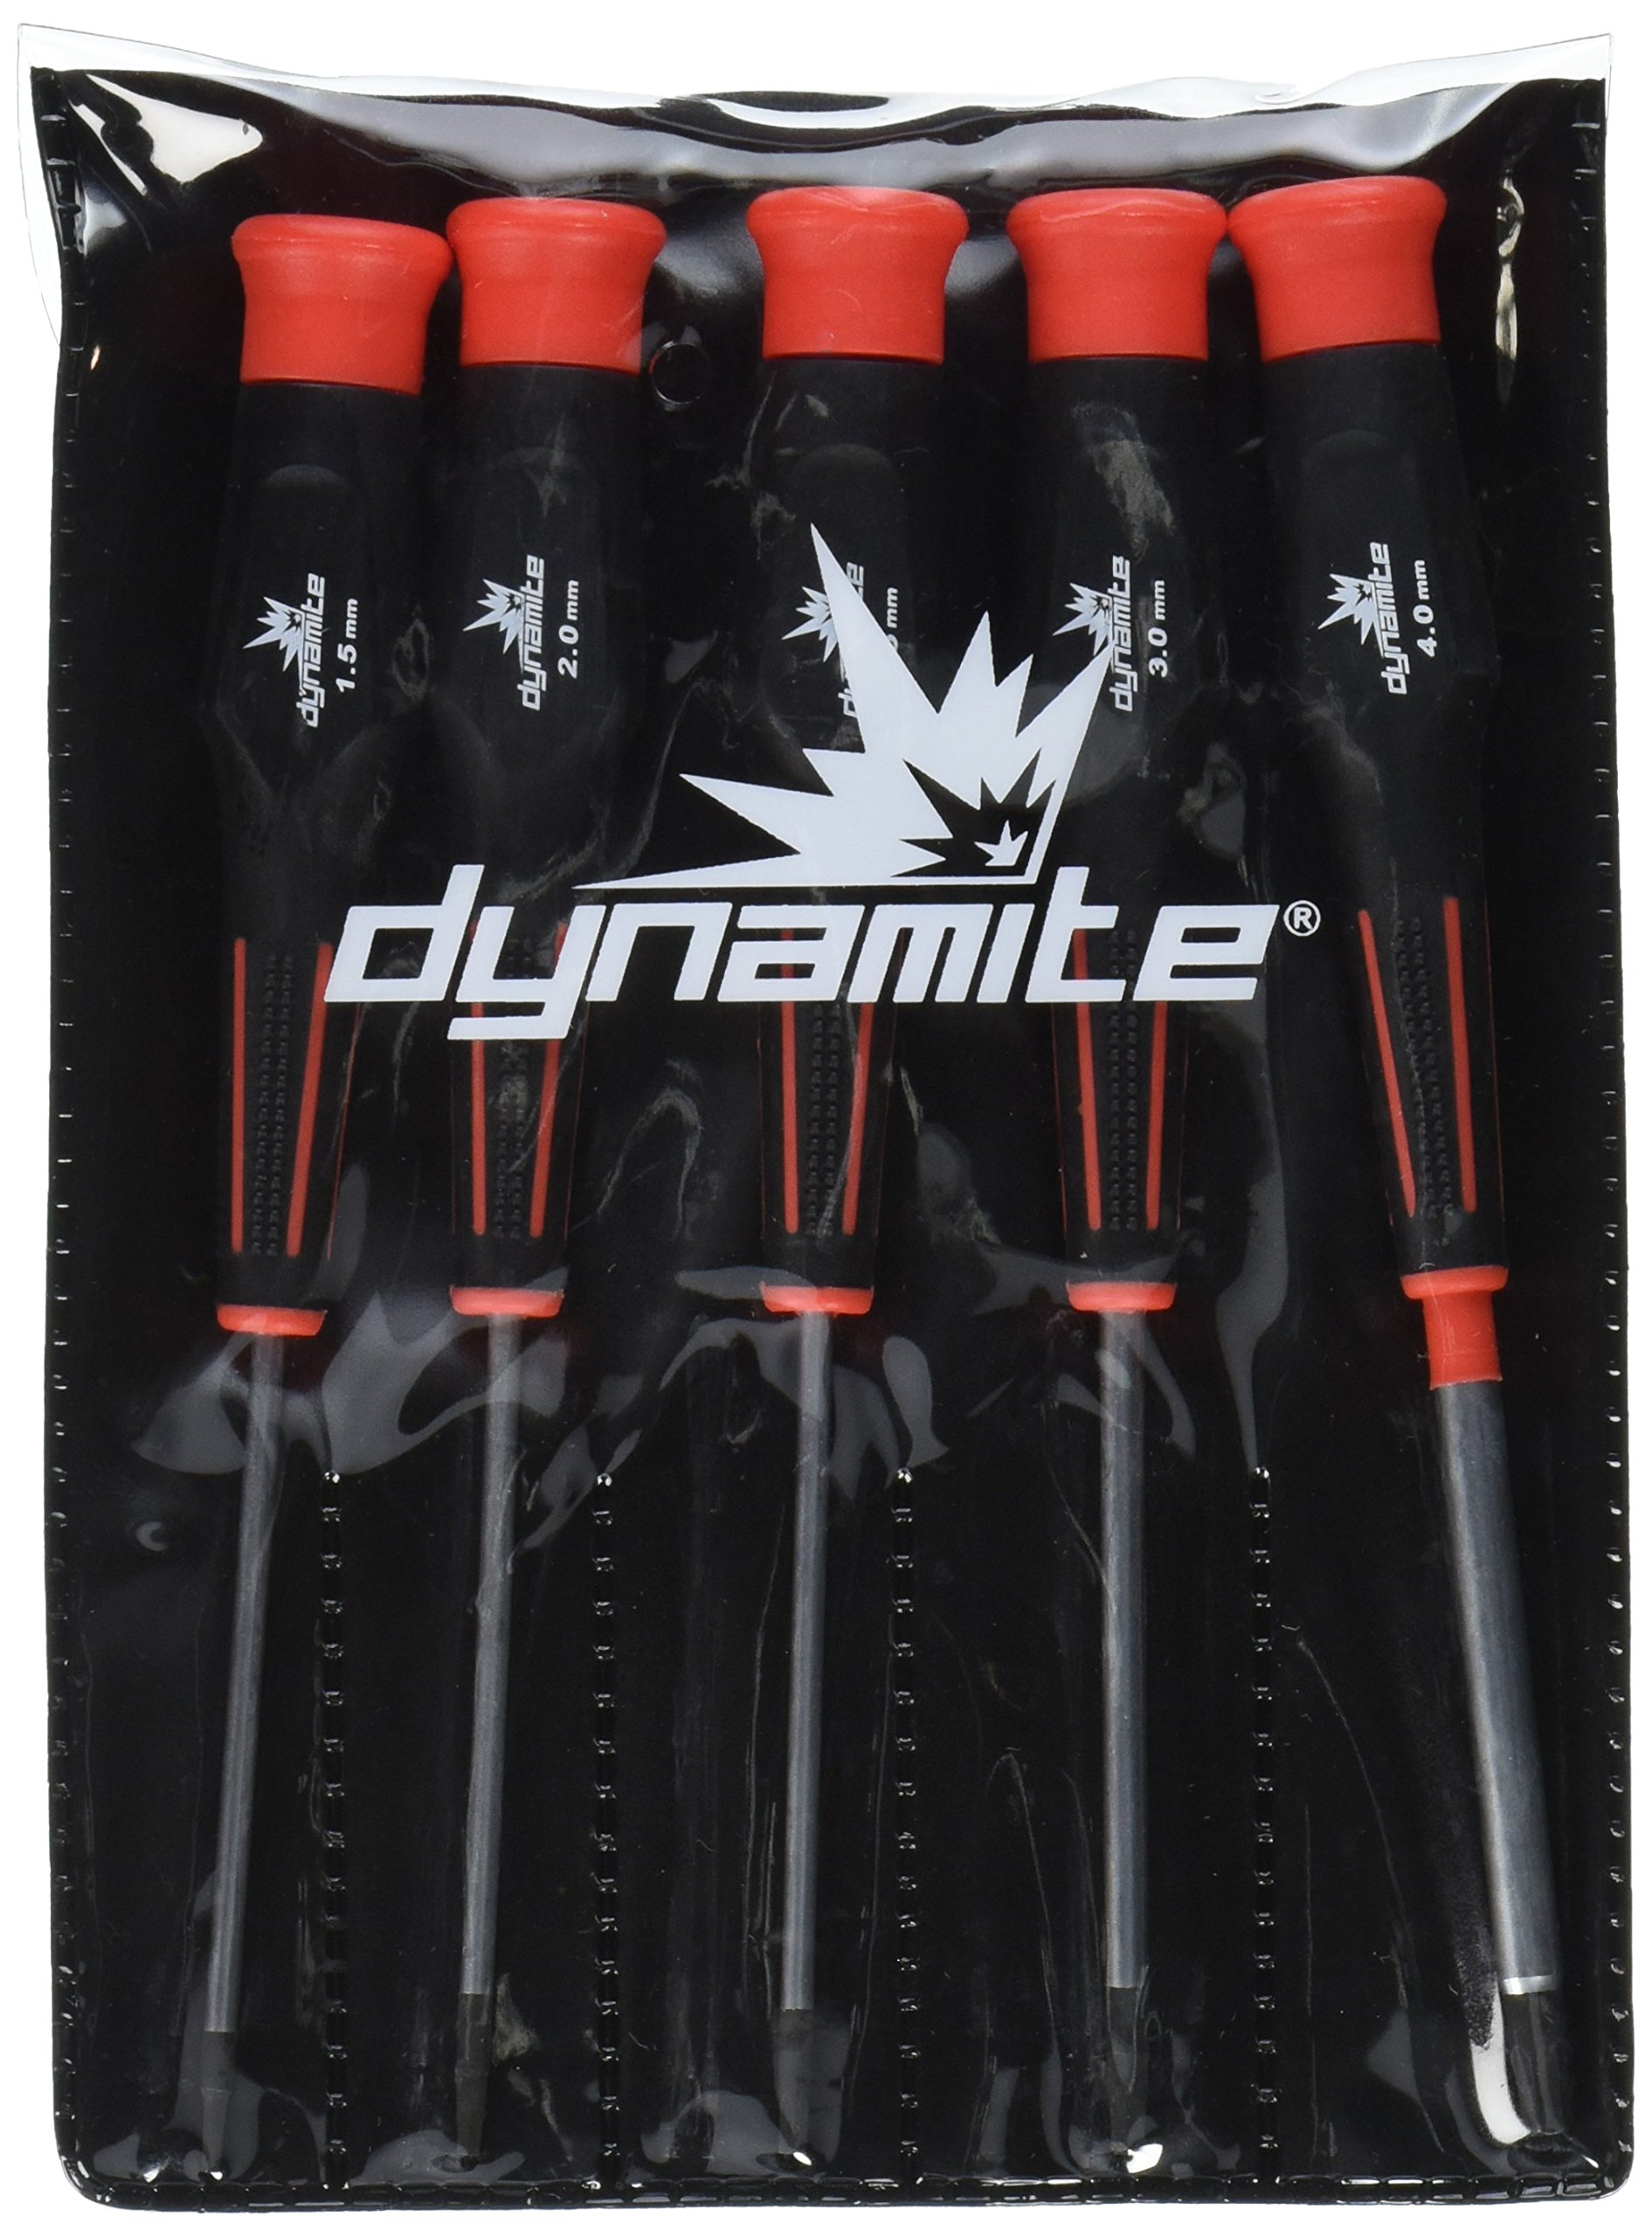 Dynamite 5 pc Metric Hex Driver Assortment